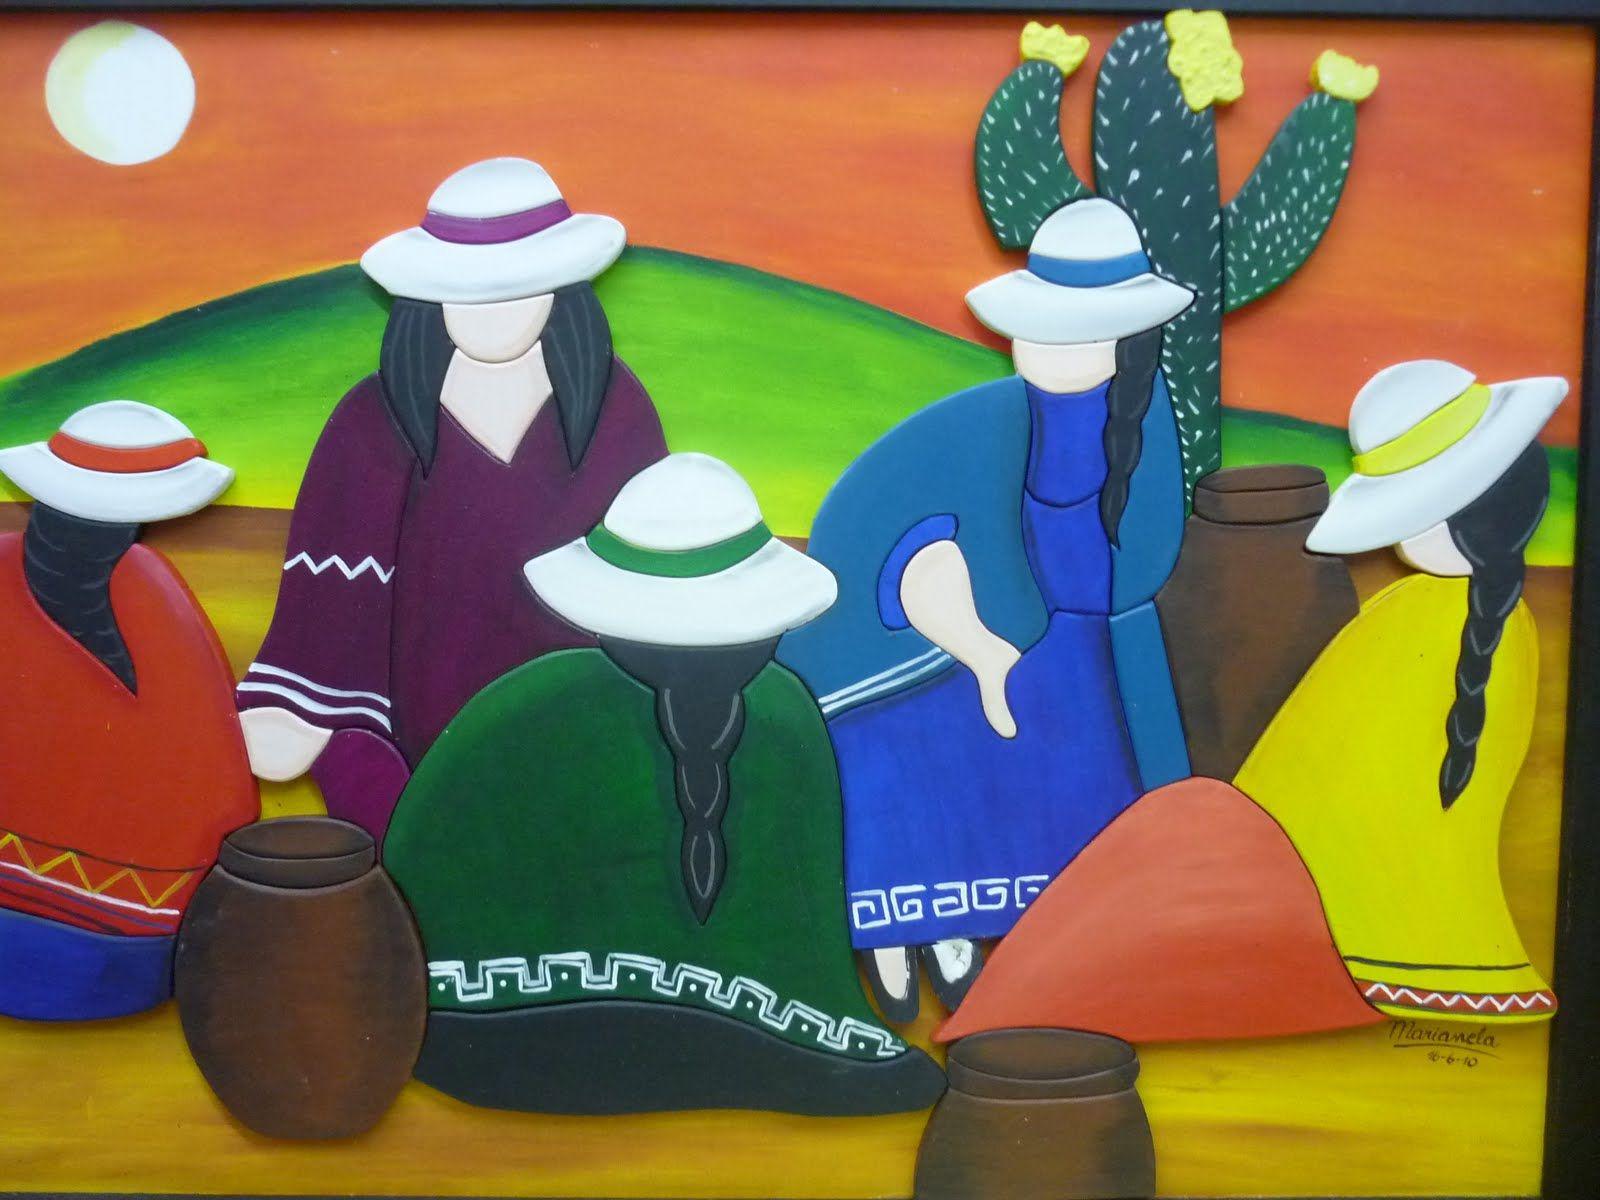 pinturas de mujeres coyas  Buscar con Google  mejikanoa